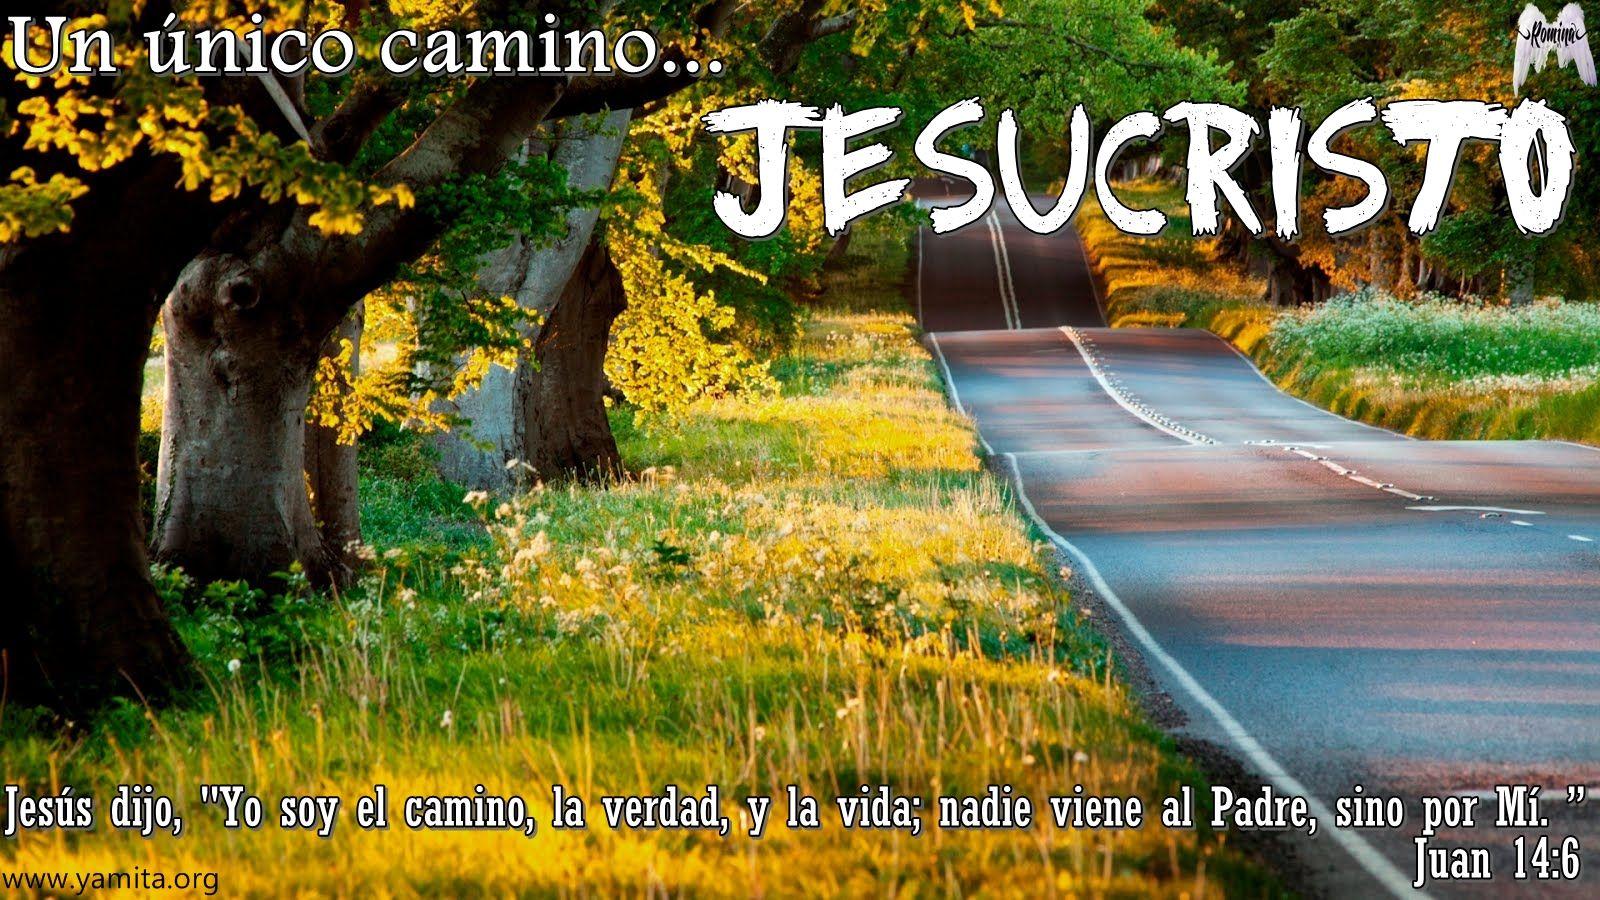 paisajes biblicos | paisajes bonitos con mensajes textuales de ...